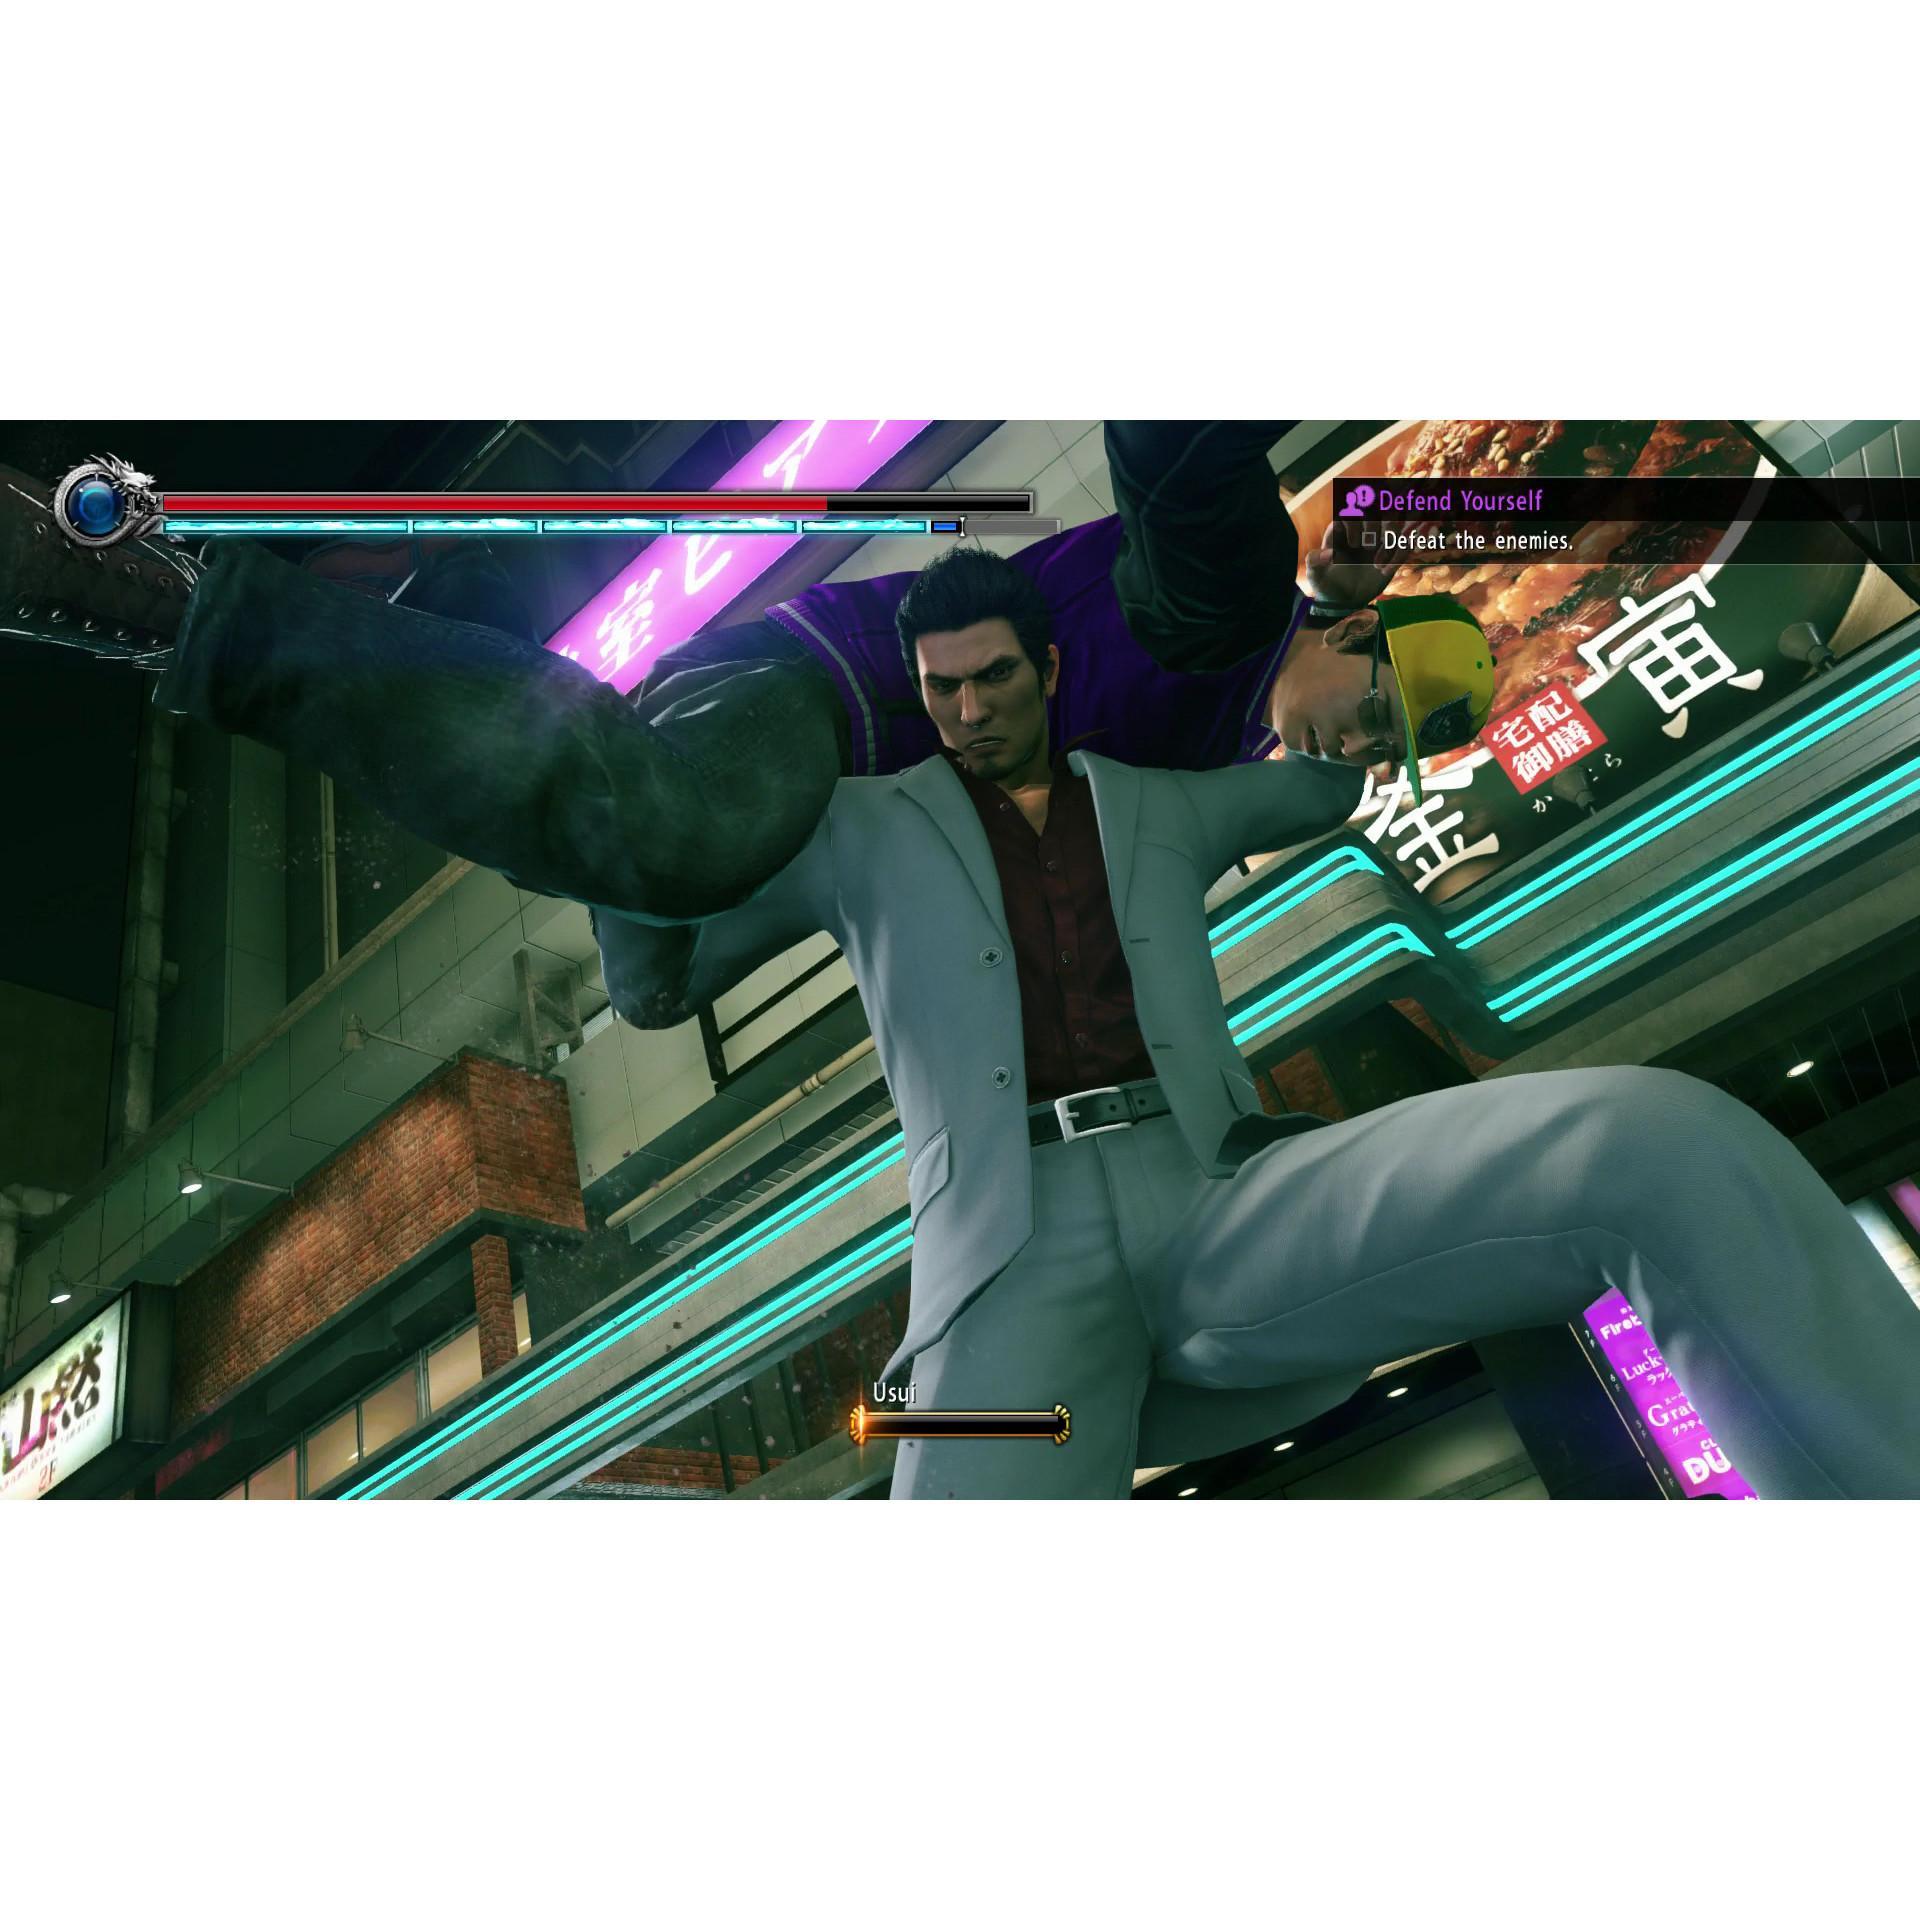 Joc Yakuza Kiwami 2 Pentru PlayStation 4 1